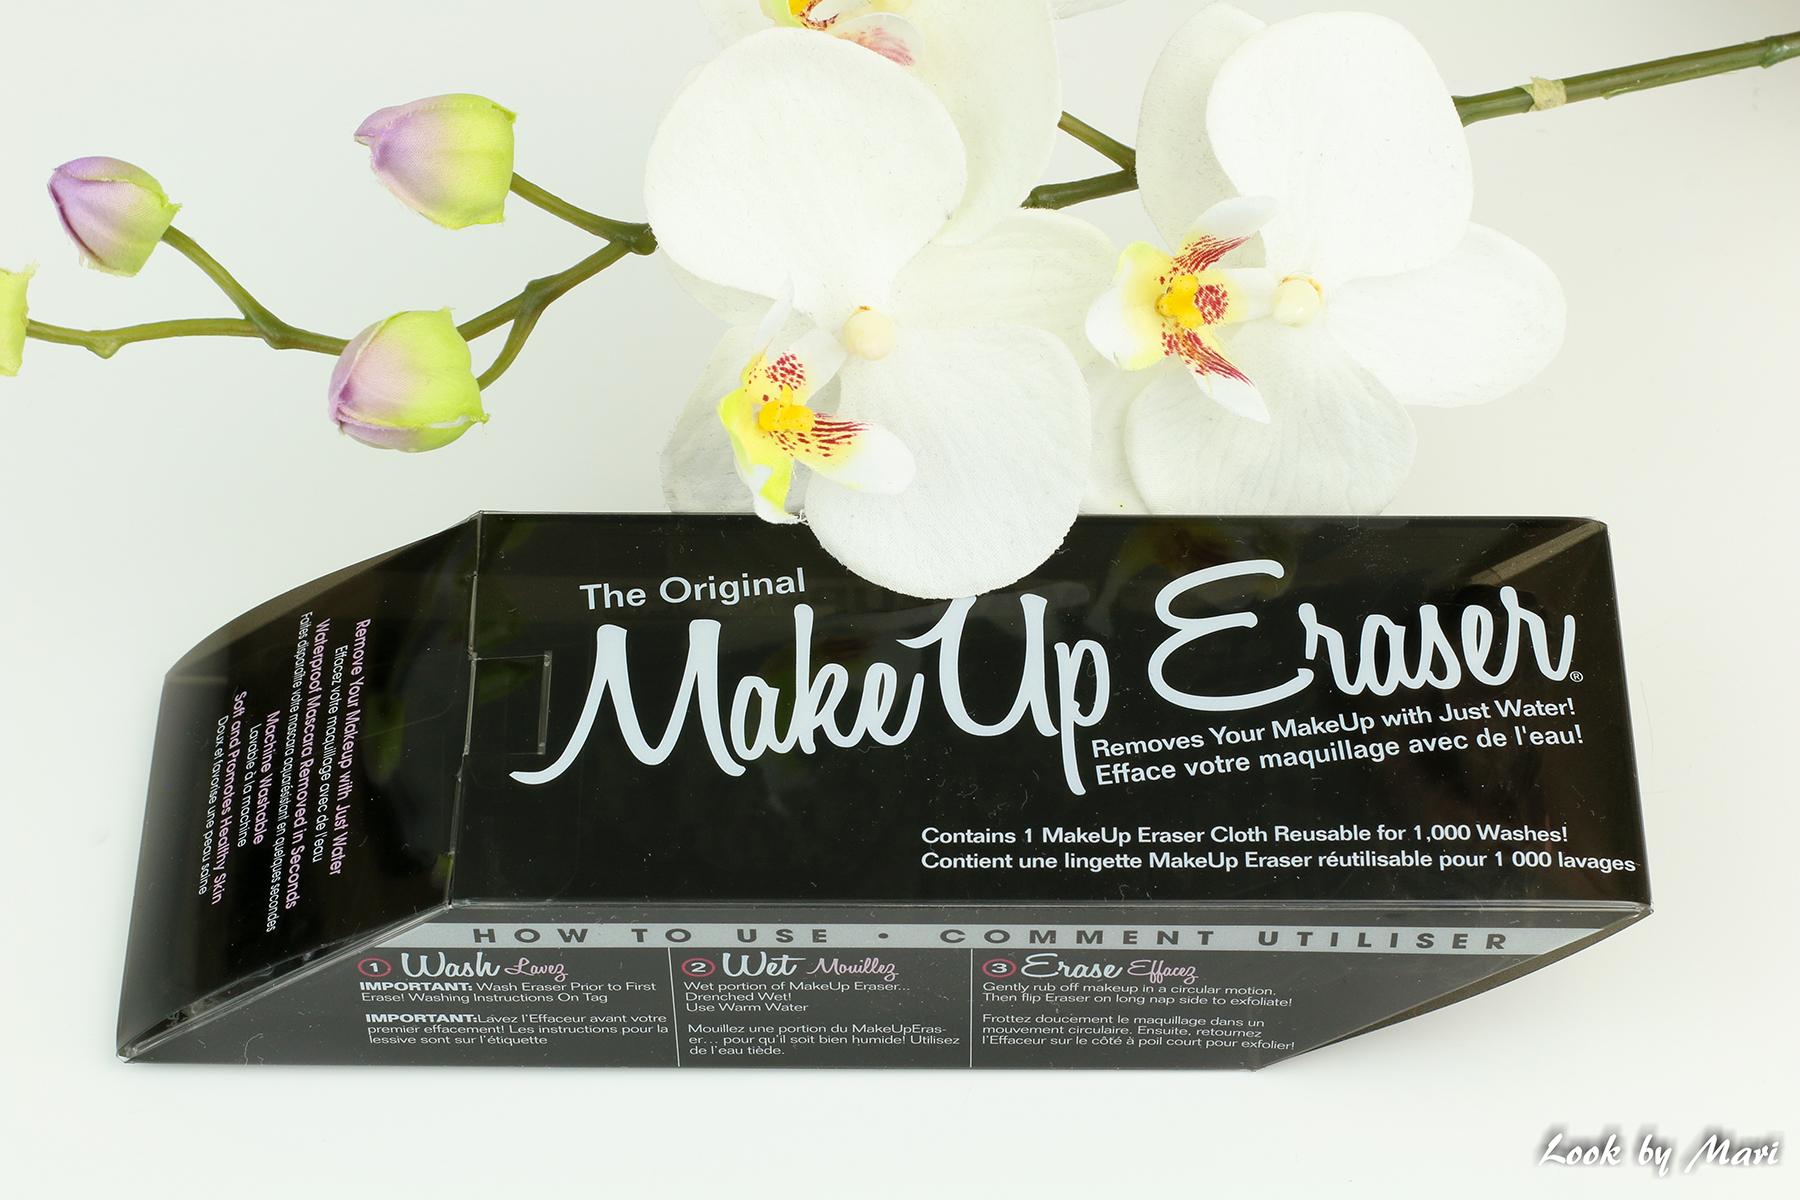 4 makeup eraser black musta review kokemuksia does it work toimiiko